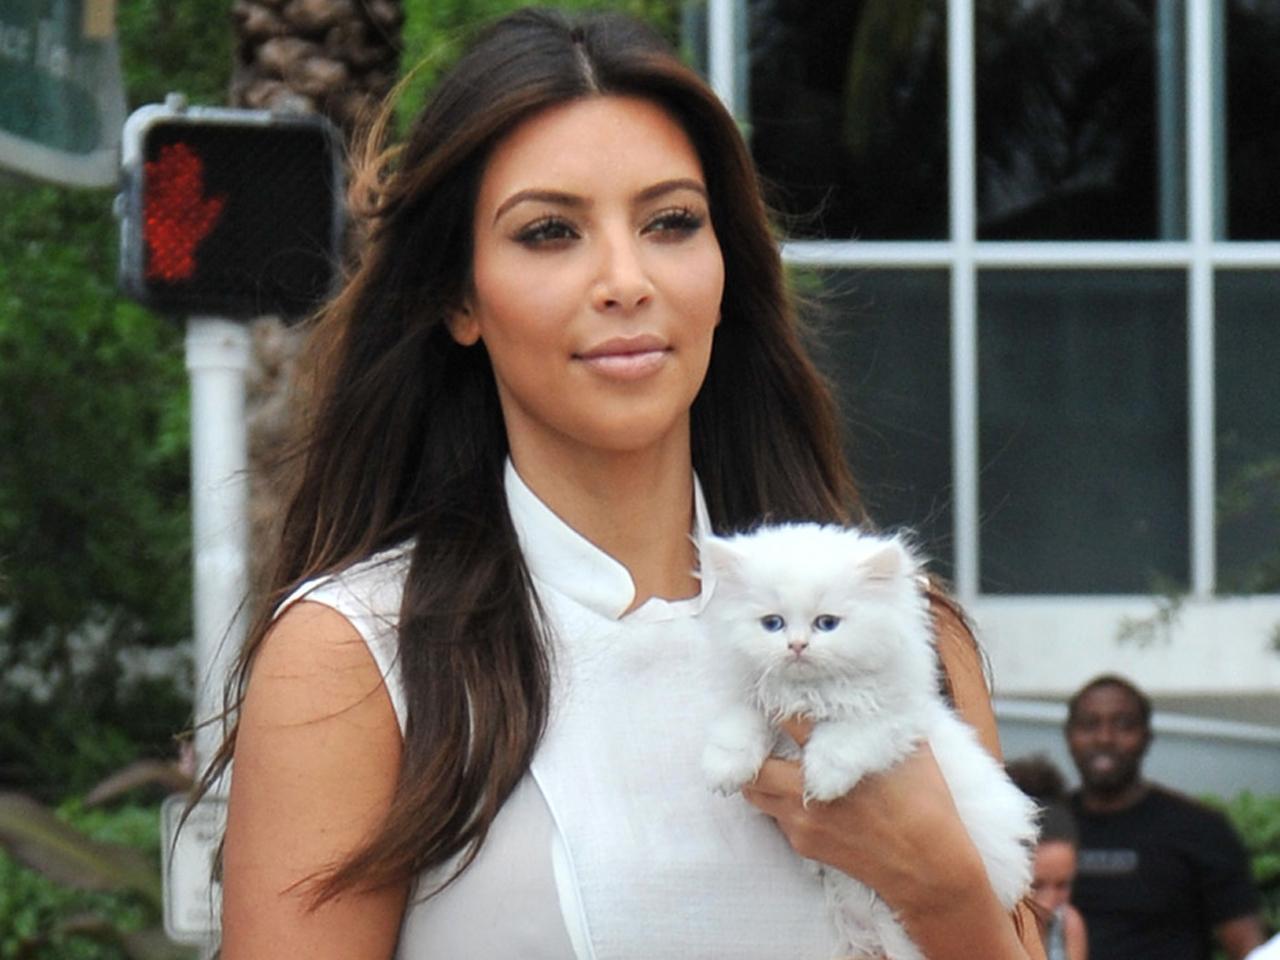 Teacup persian kittens kim kardashian